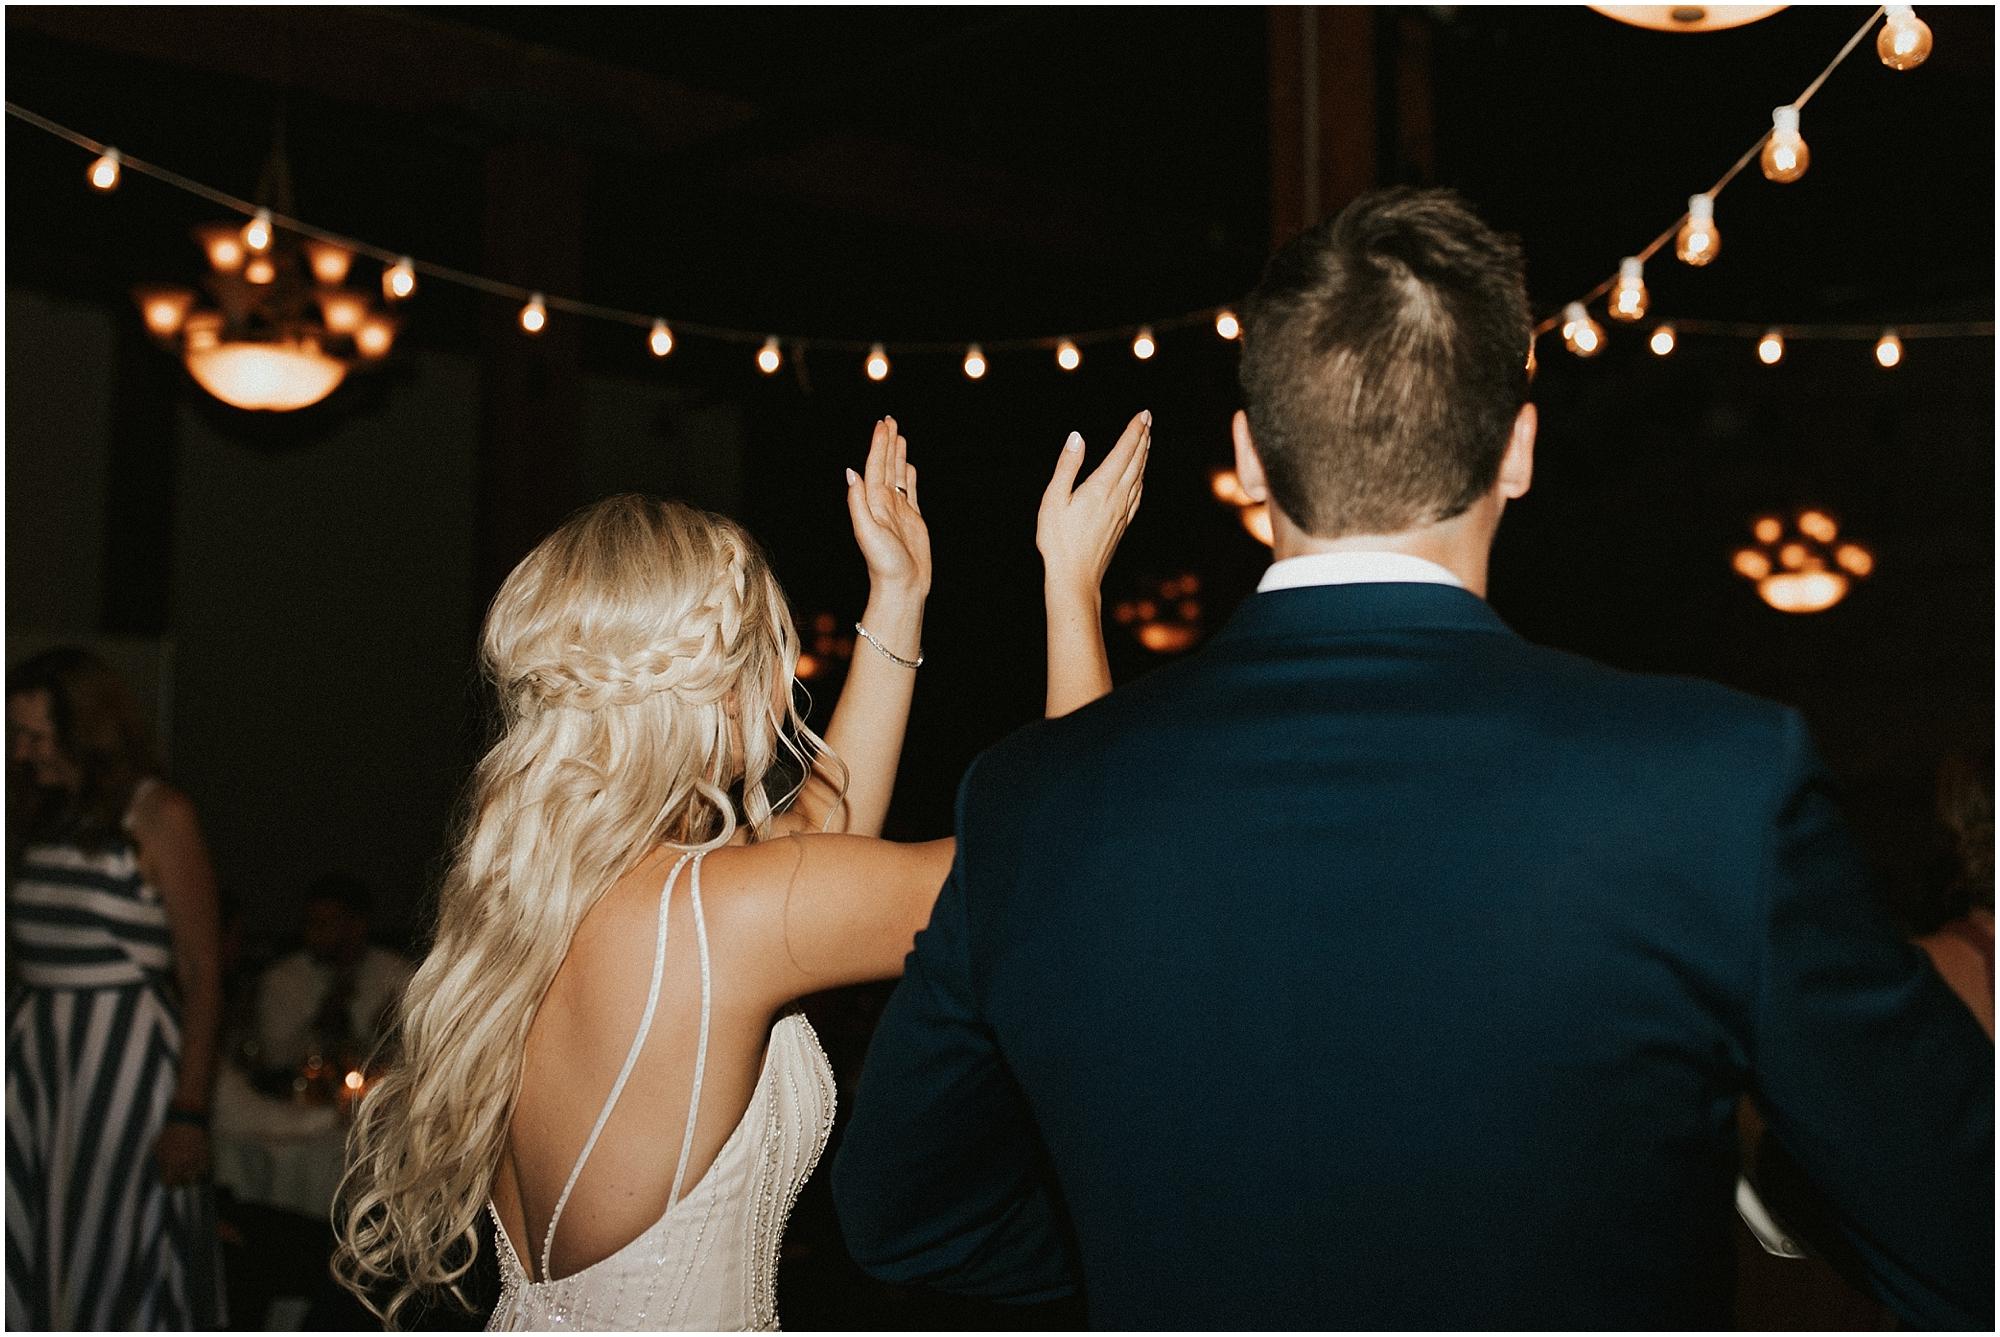 Chateau Rive Spokane Wedding Cassie Trottier Photography1177.jpg